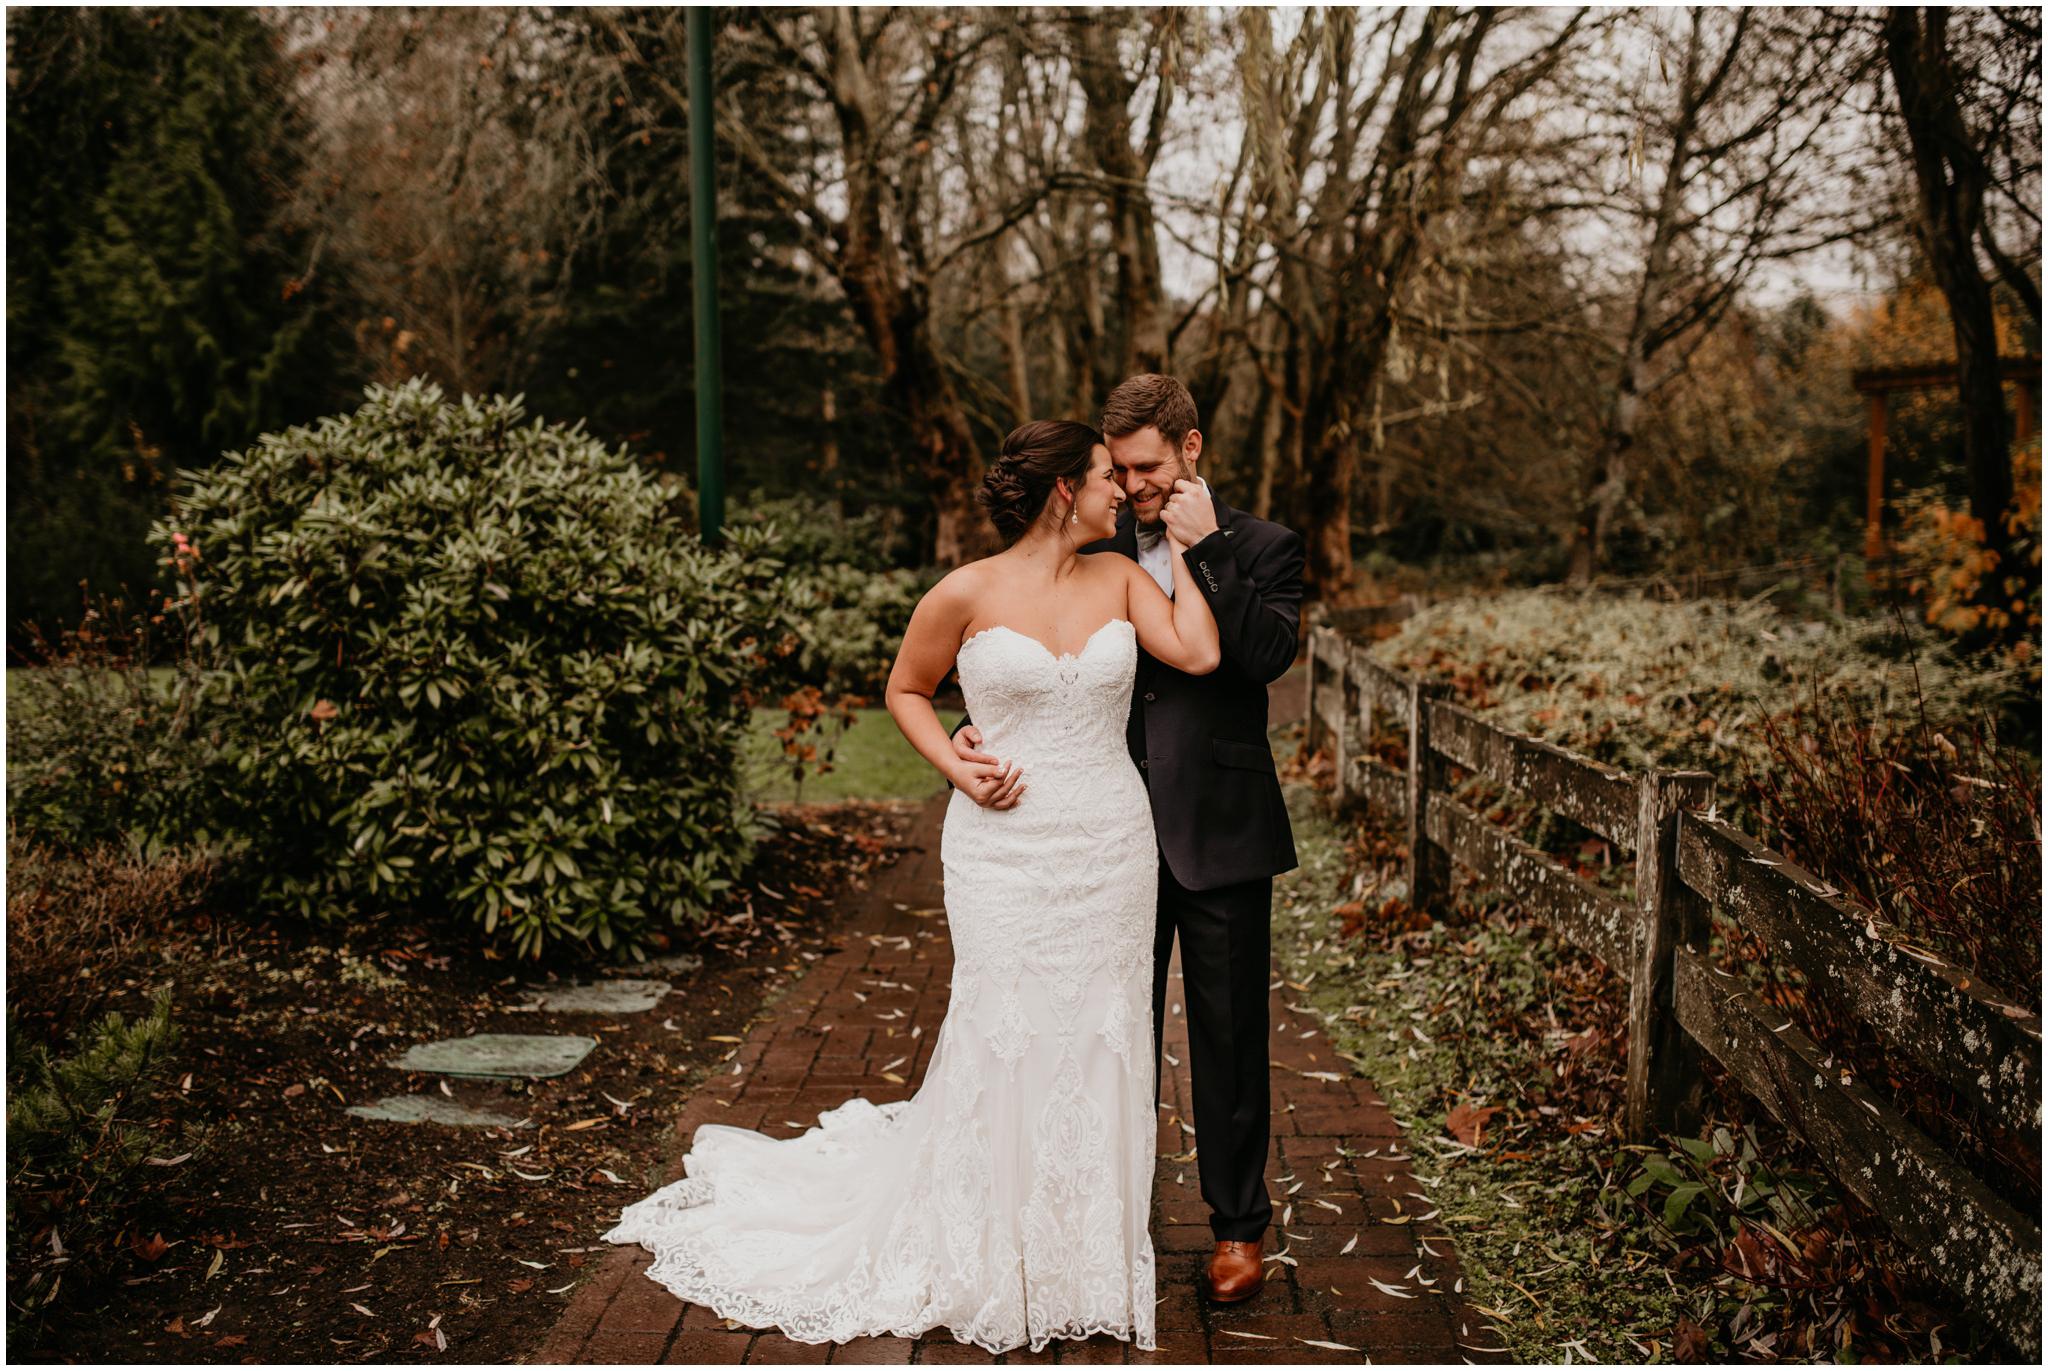 ashley-tj-the-pickering-barn-winter-wedding-seattle-photographer-027.jpg